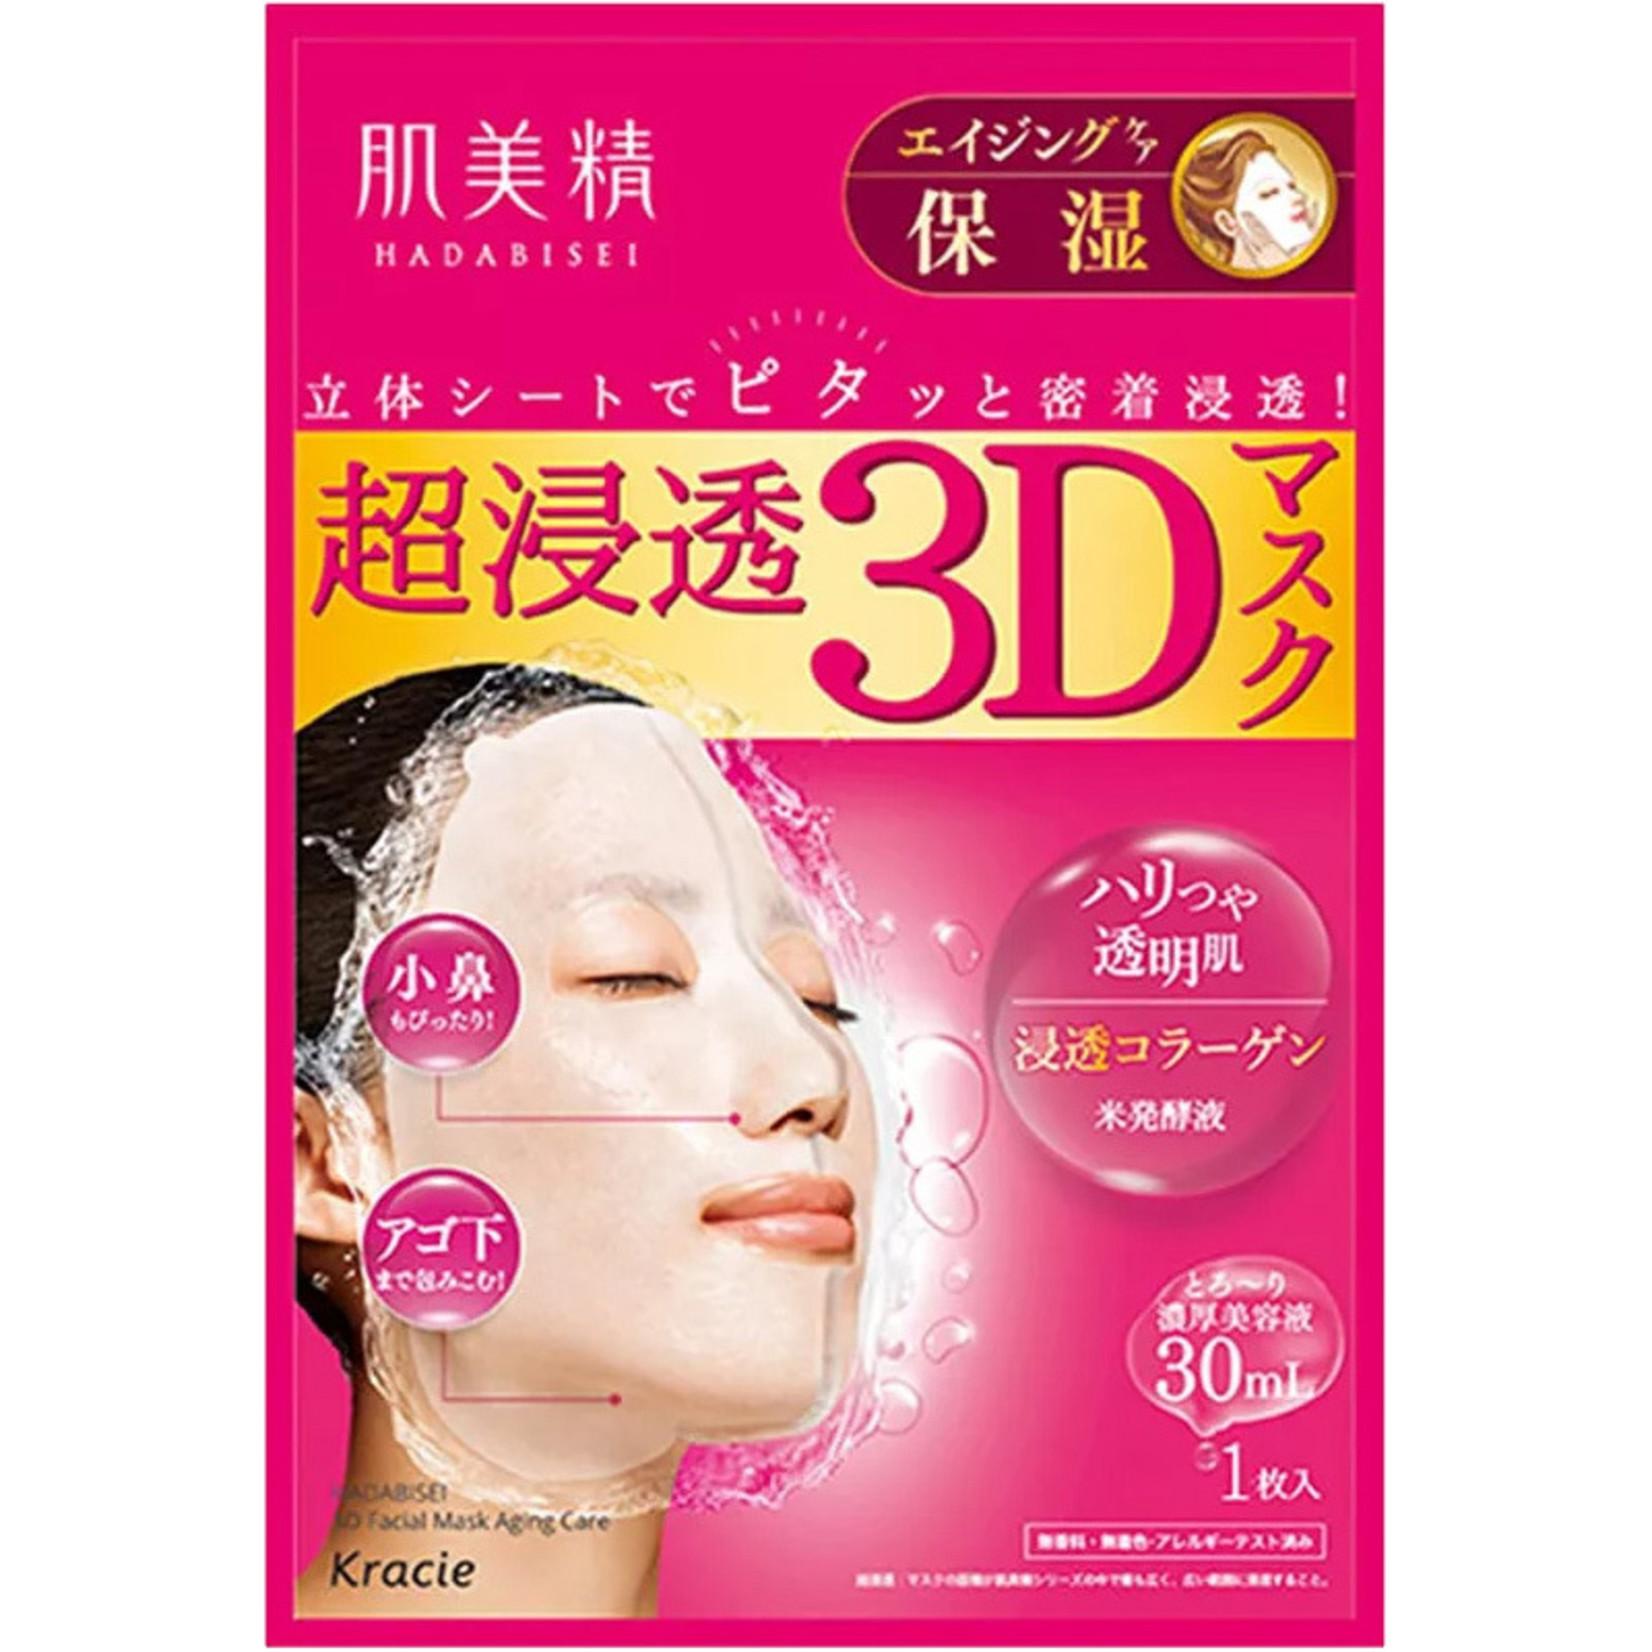 Kracie Hadabisei 3D Face Mask (Moisturizing)